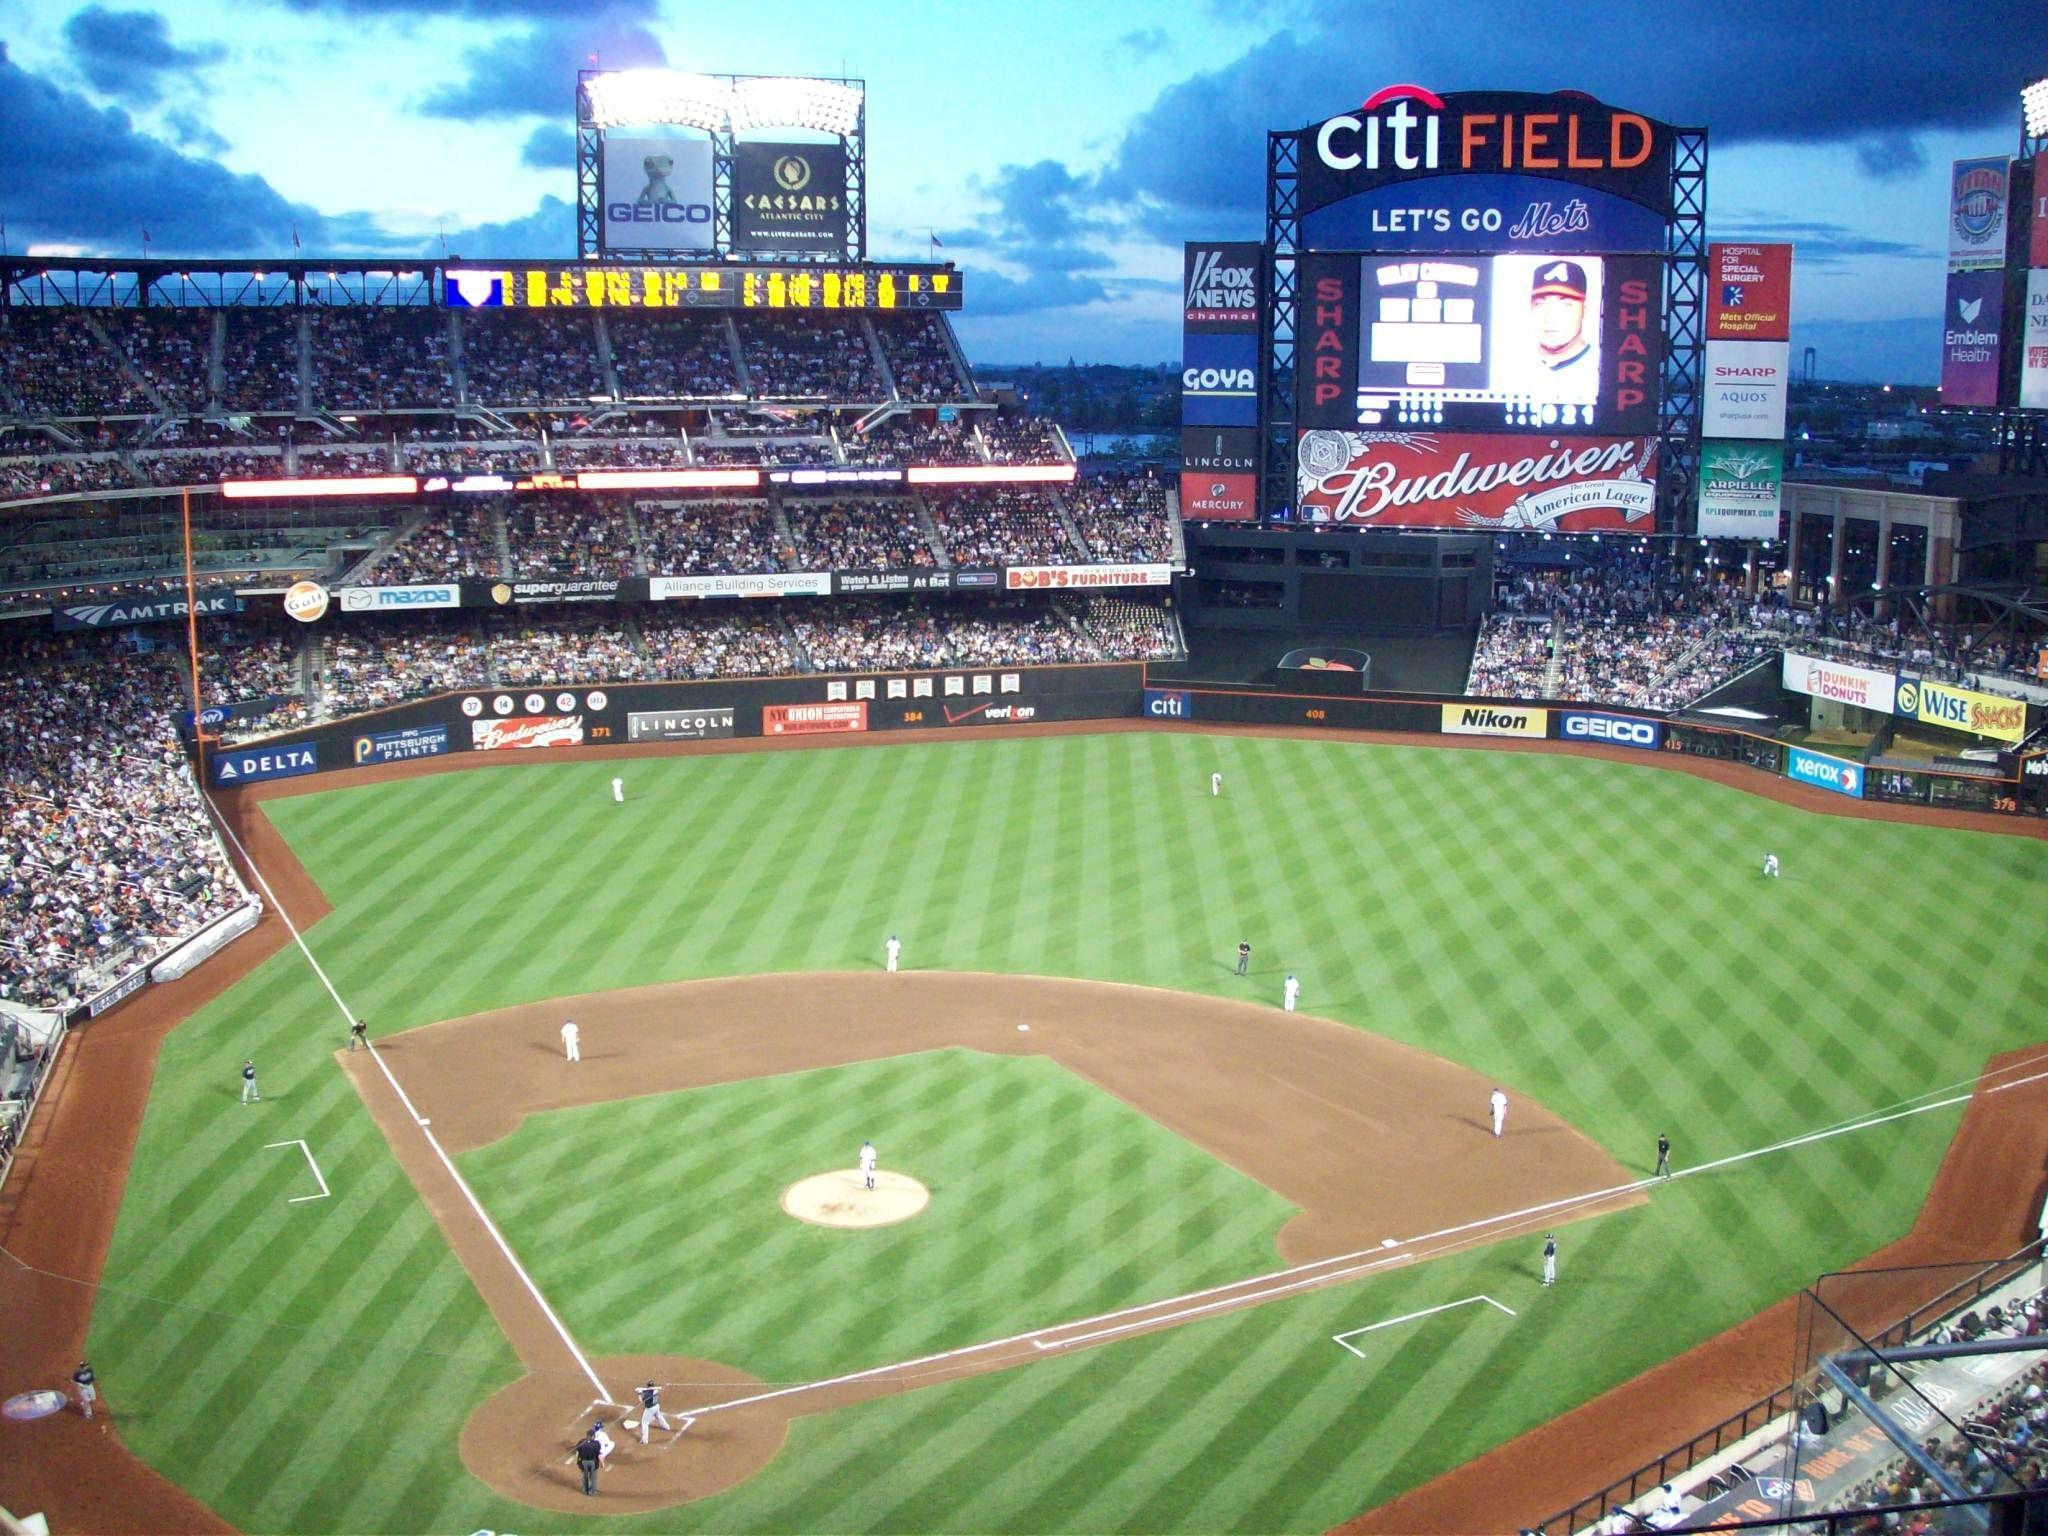 NY Mets at Citi Field